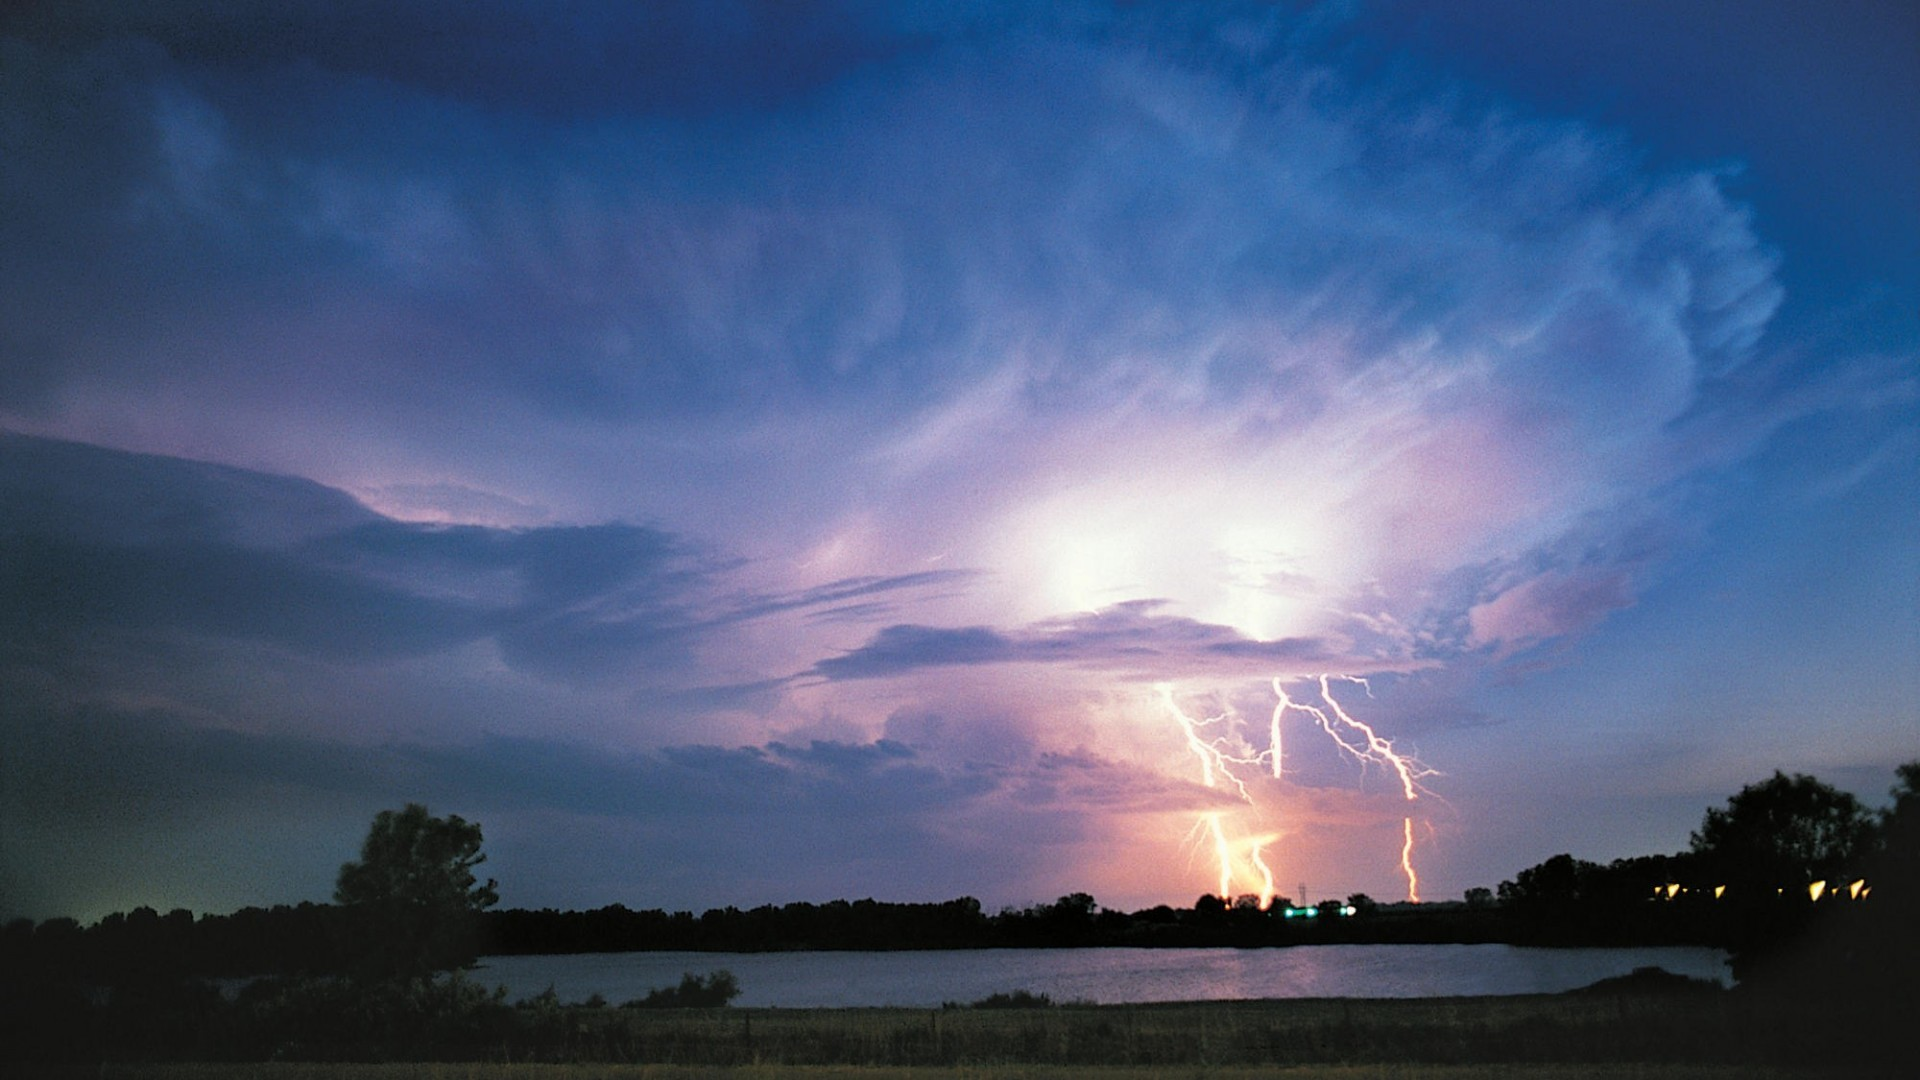 Stormy Skies Lightning.